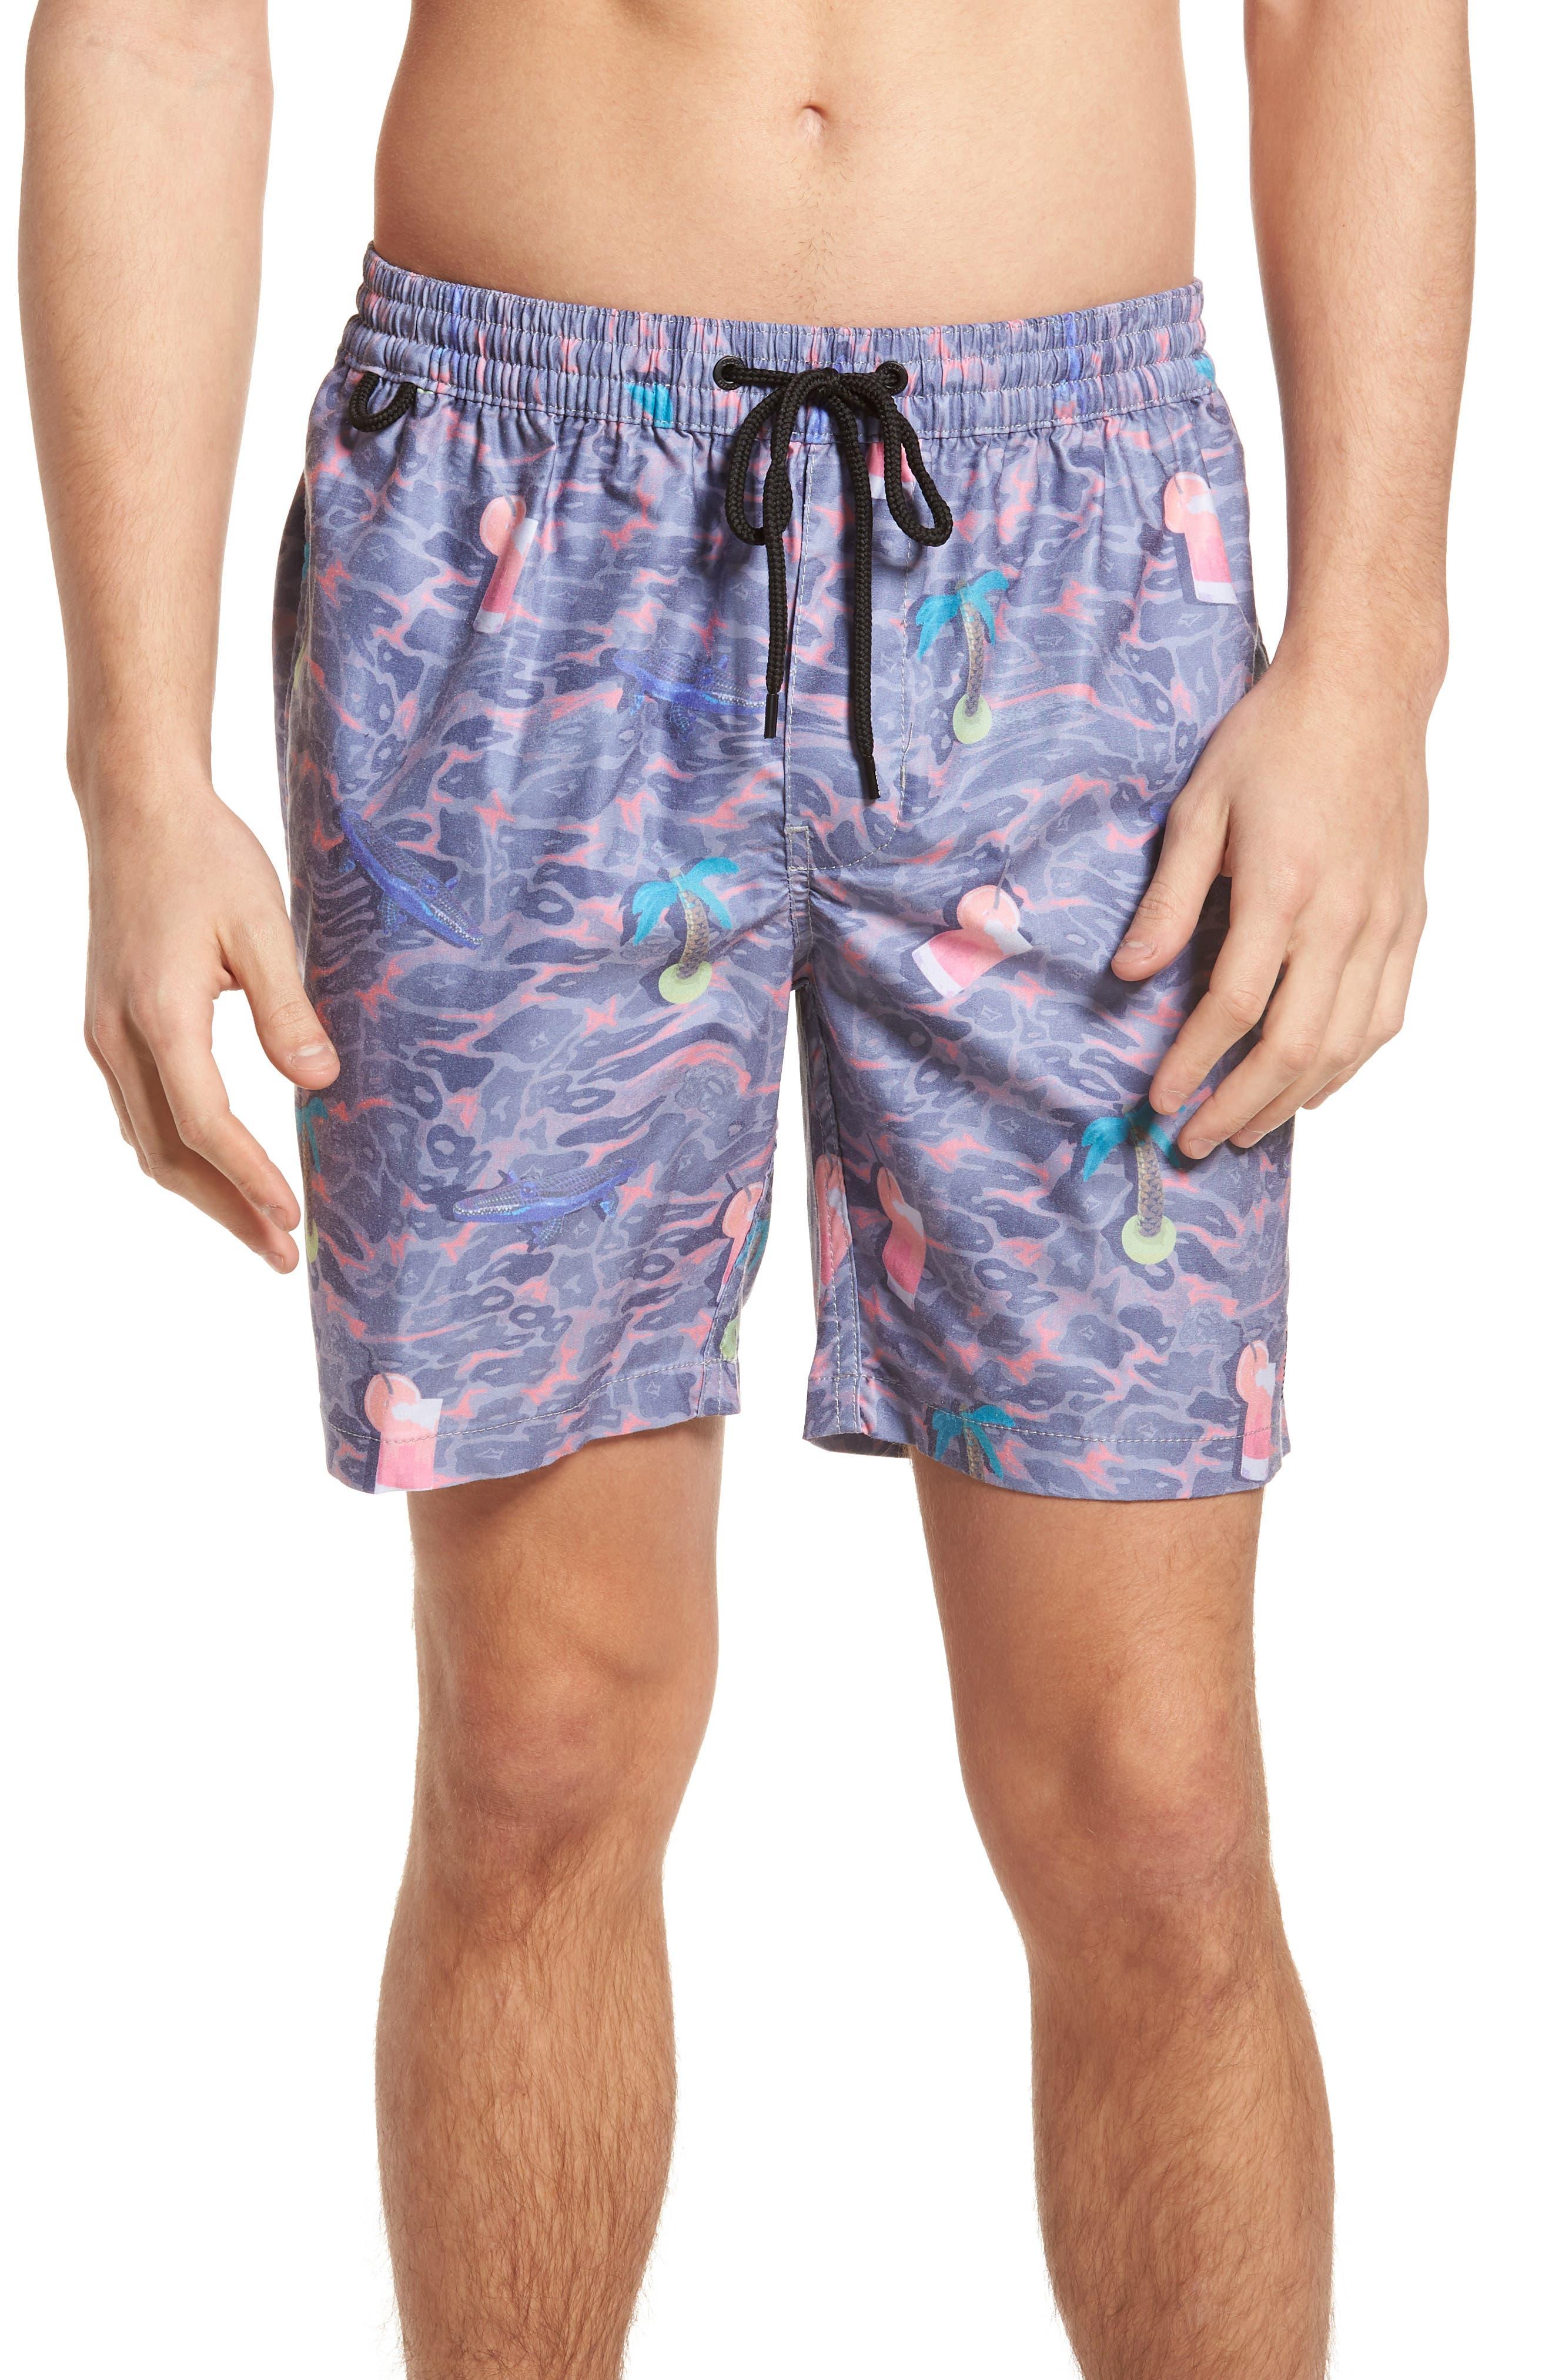 Deep End Pool Shorts,                         Main,                         color, 950